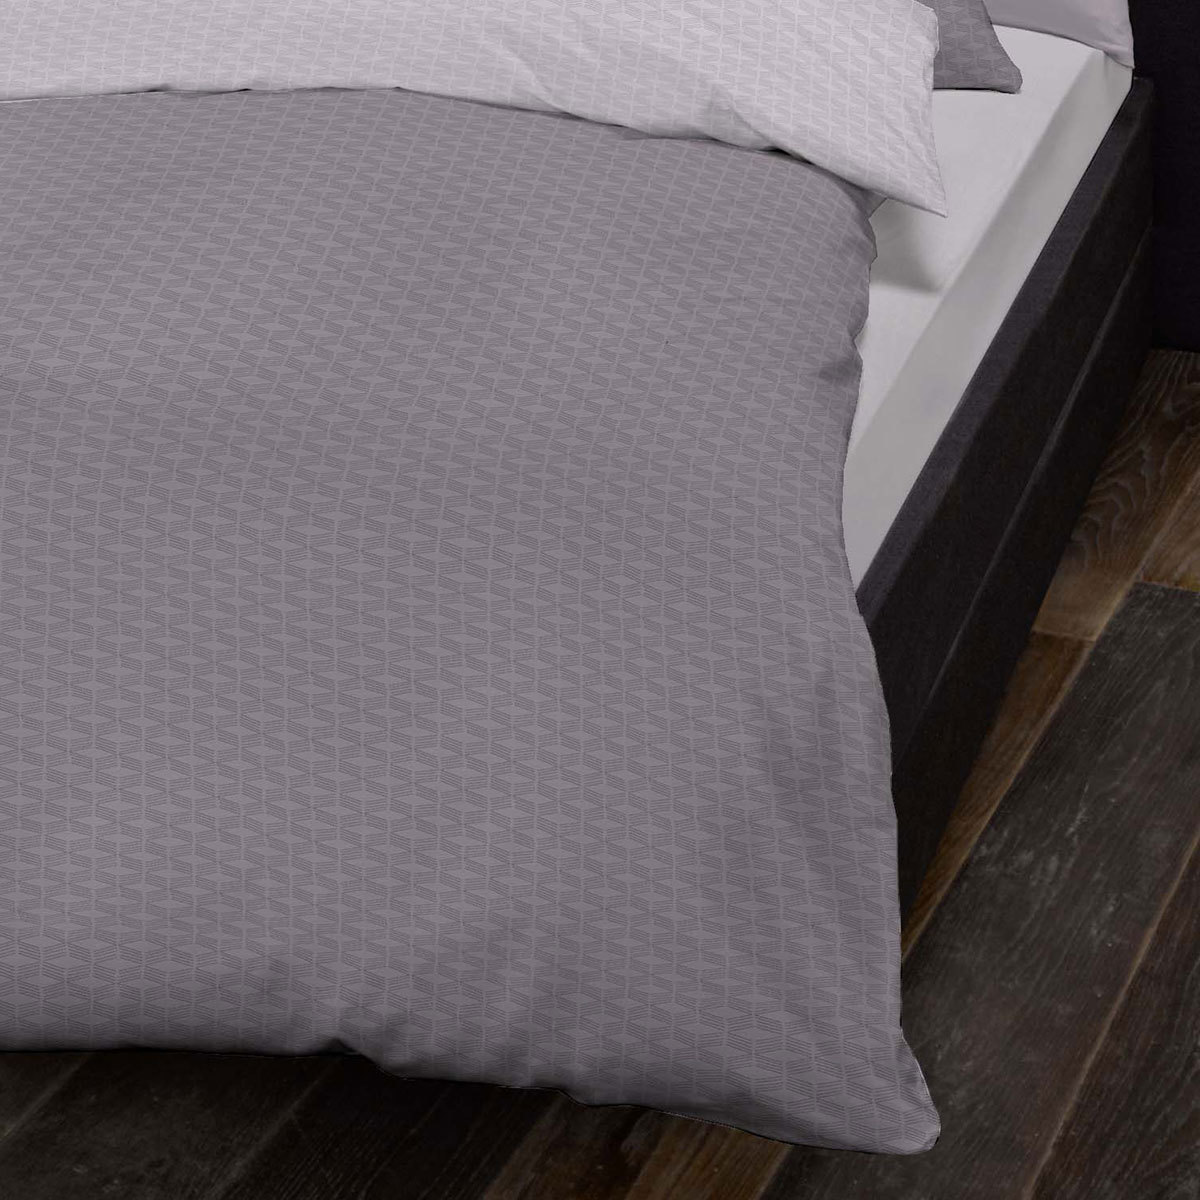 schlafgut mako satin bettw sche negro grenadine g nstig. Black Bedroom Furniture Sets. Home Design Ideas